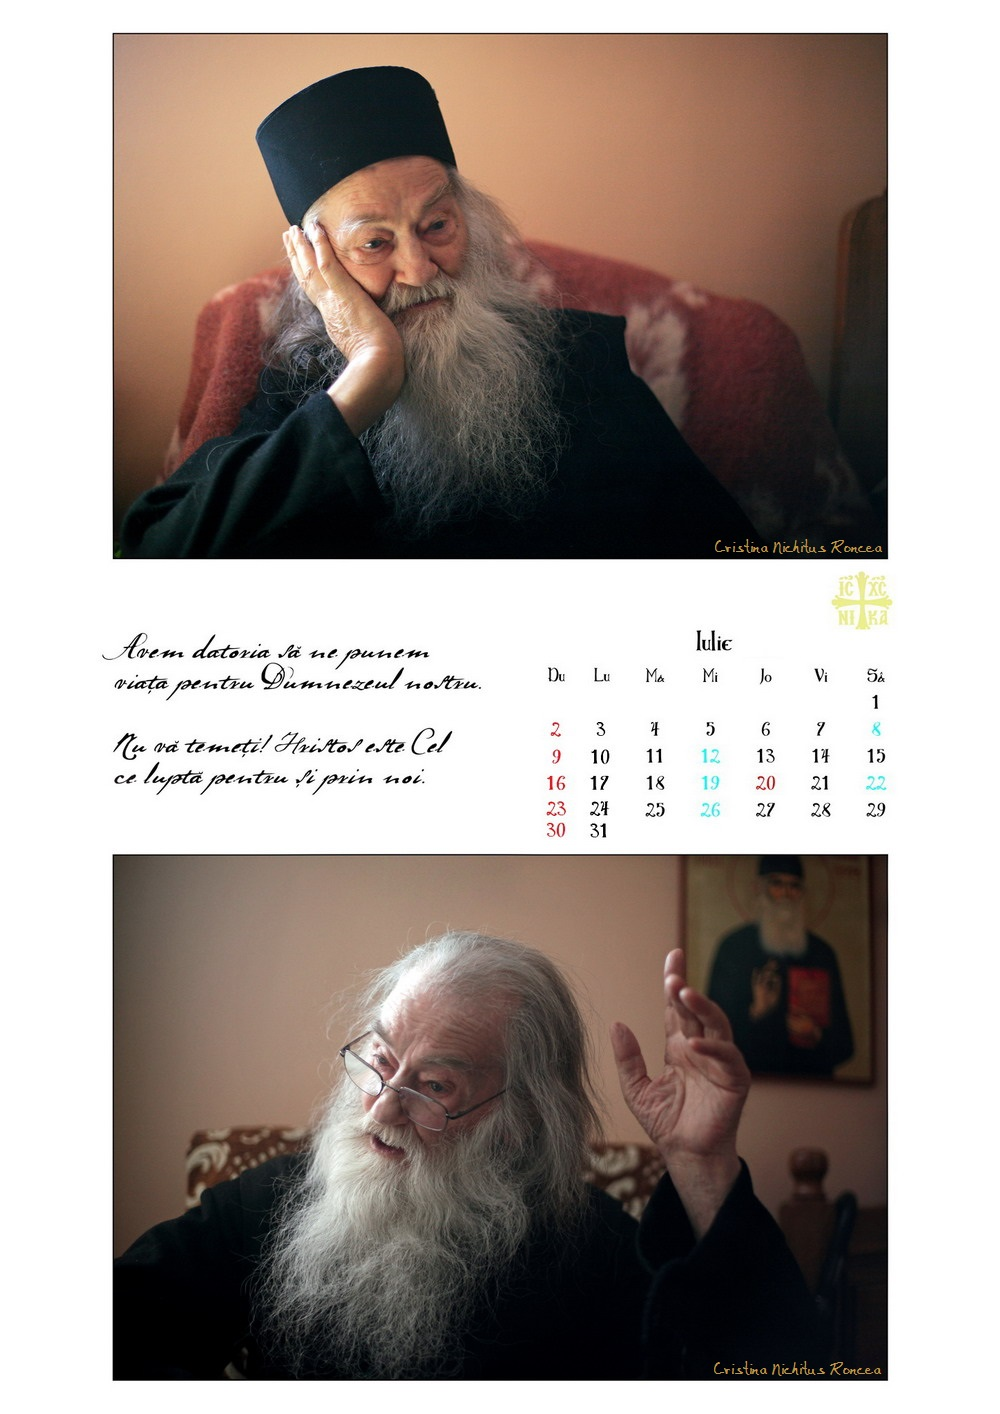 Calendar 2017 Parintele Justin Parvu Ro - Foto Cristina Nichitus Roncea si Manastirea Petru Voda 09